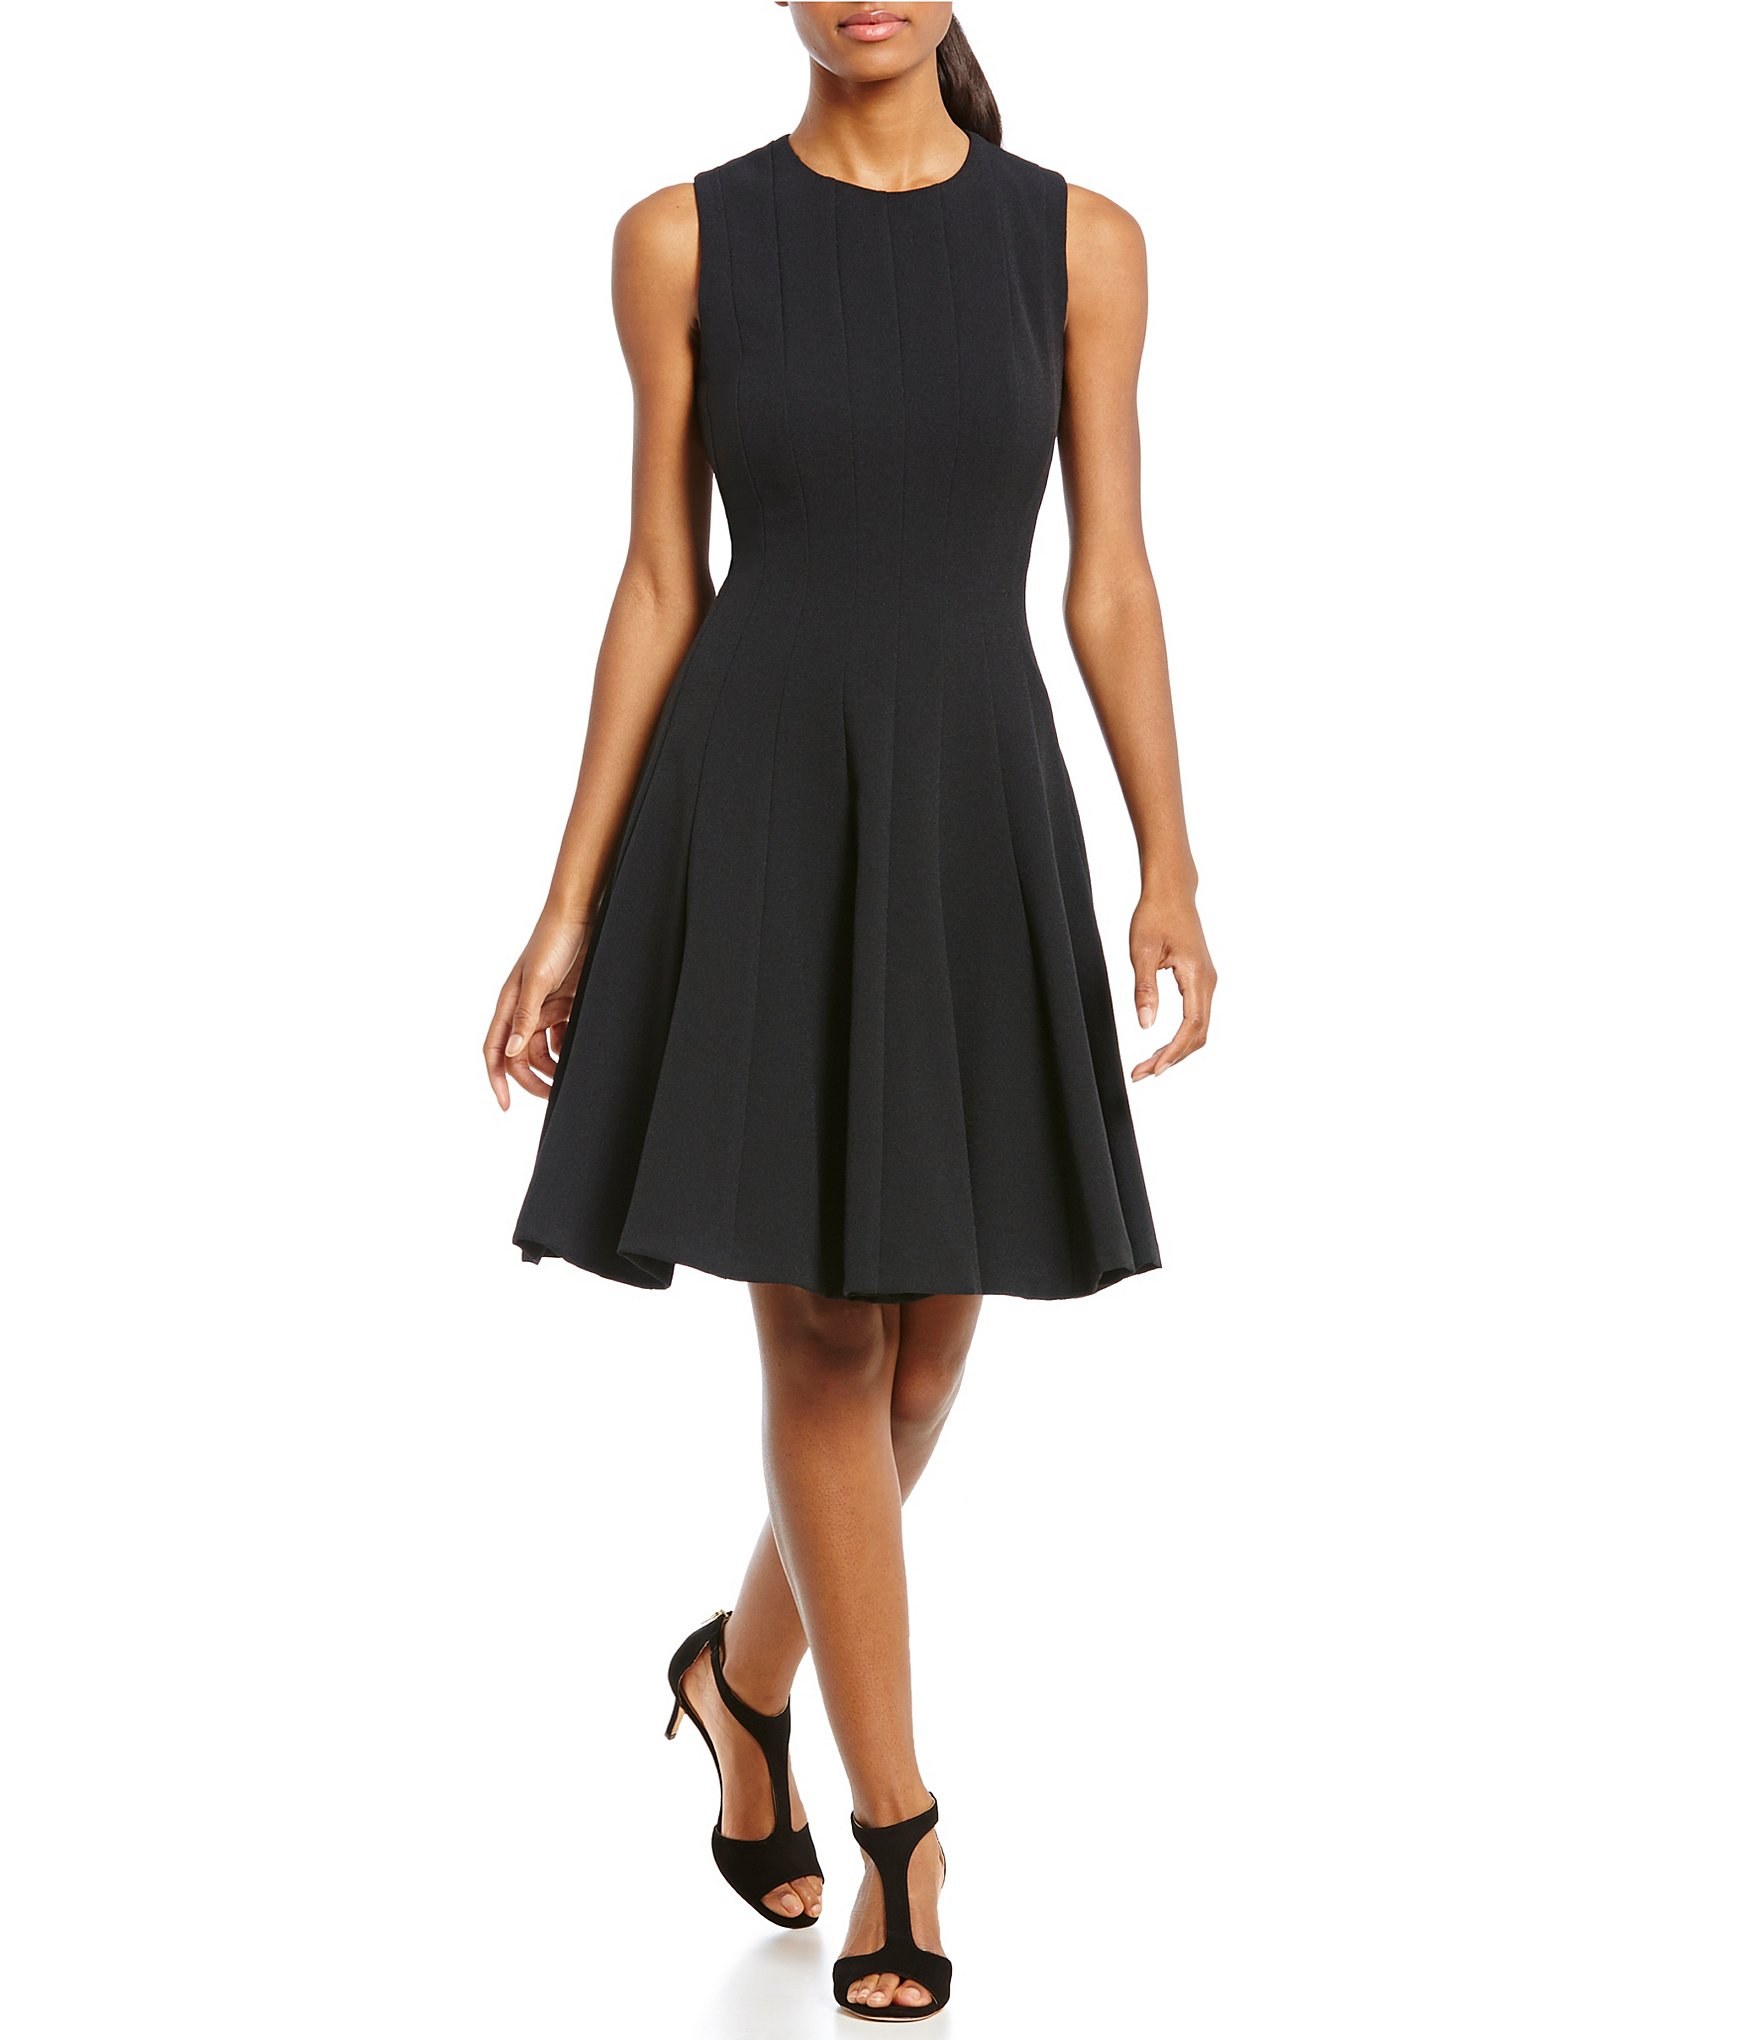 Black dress under knee - Black Dress Under Knee 46